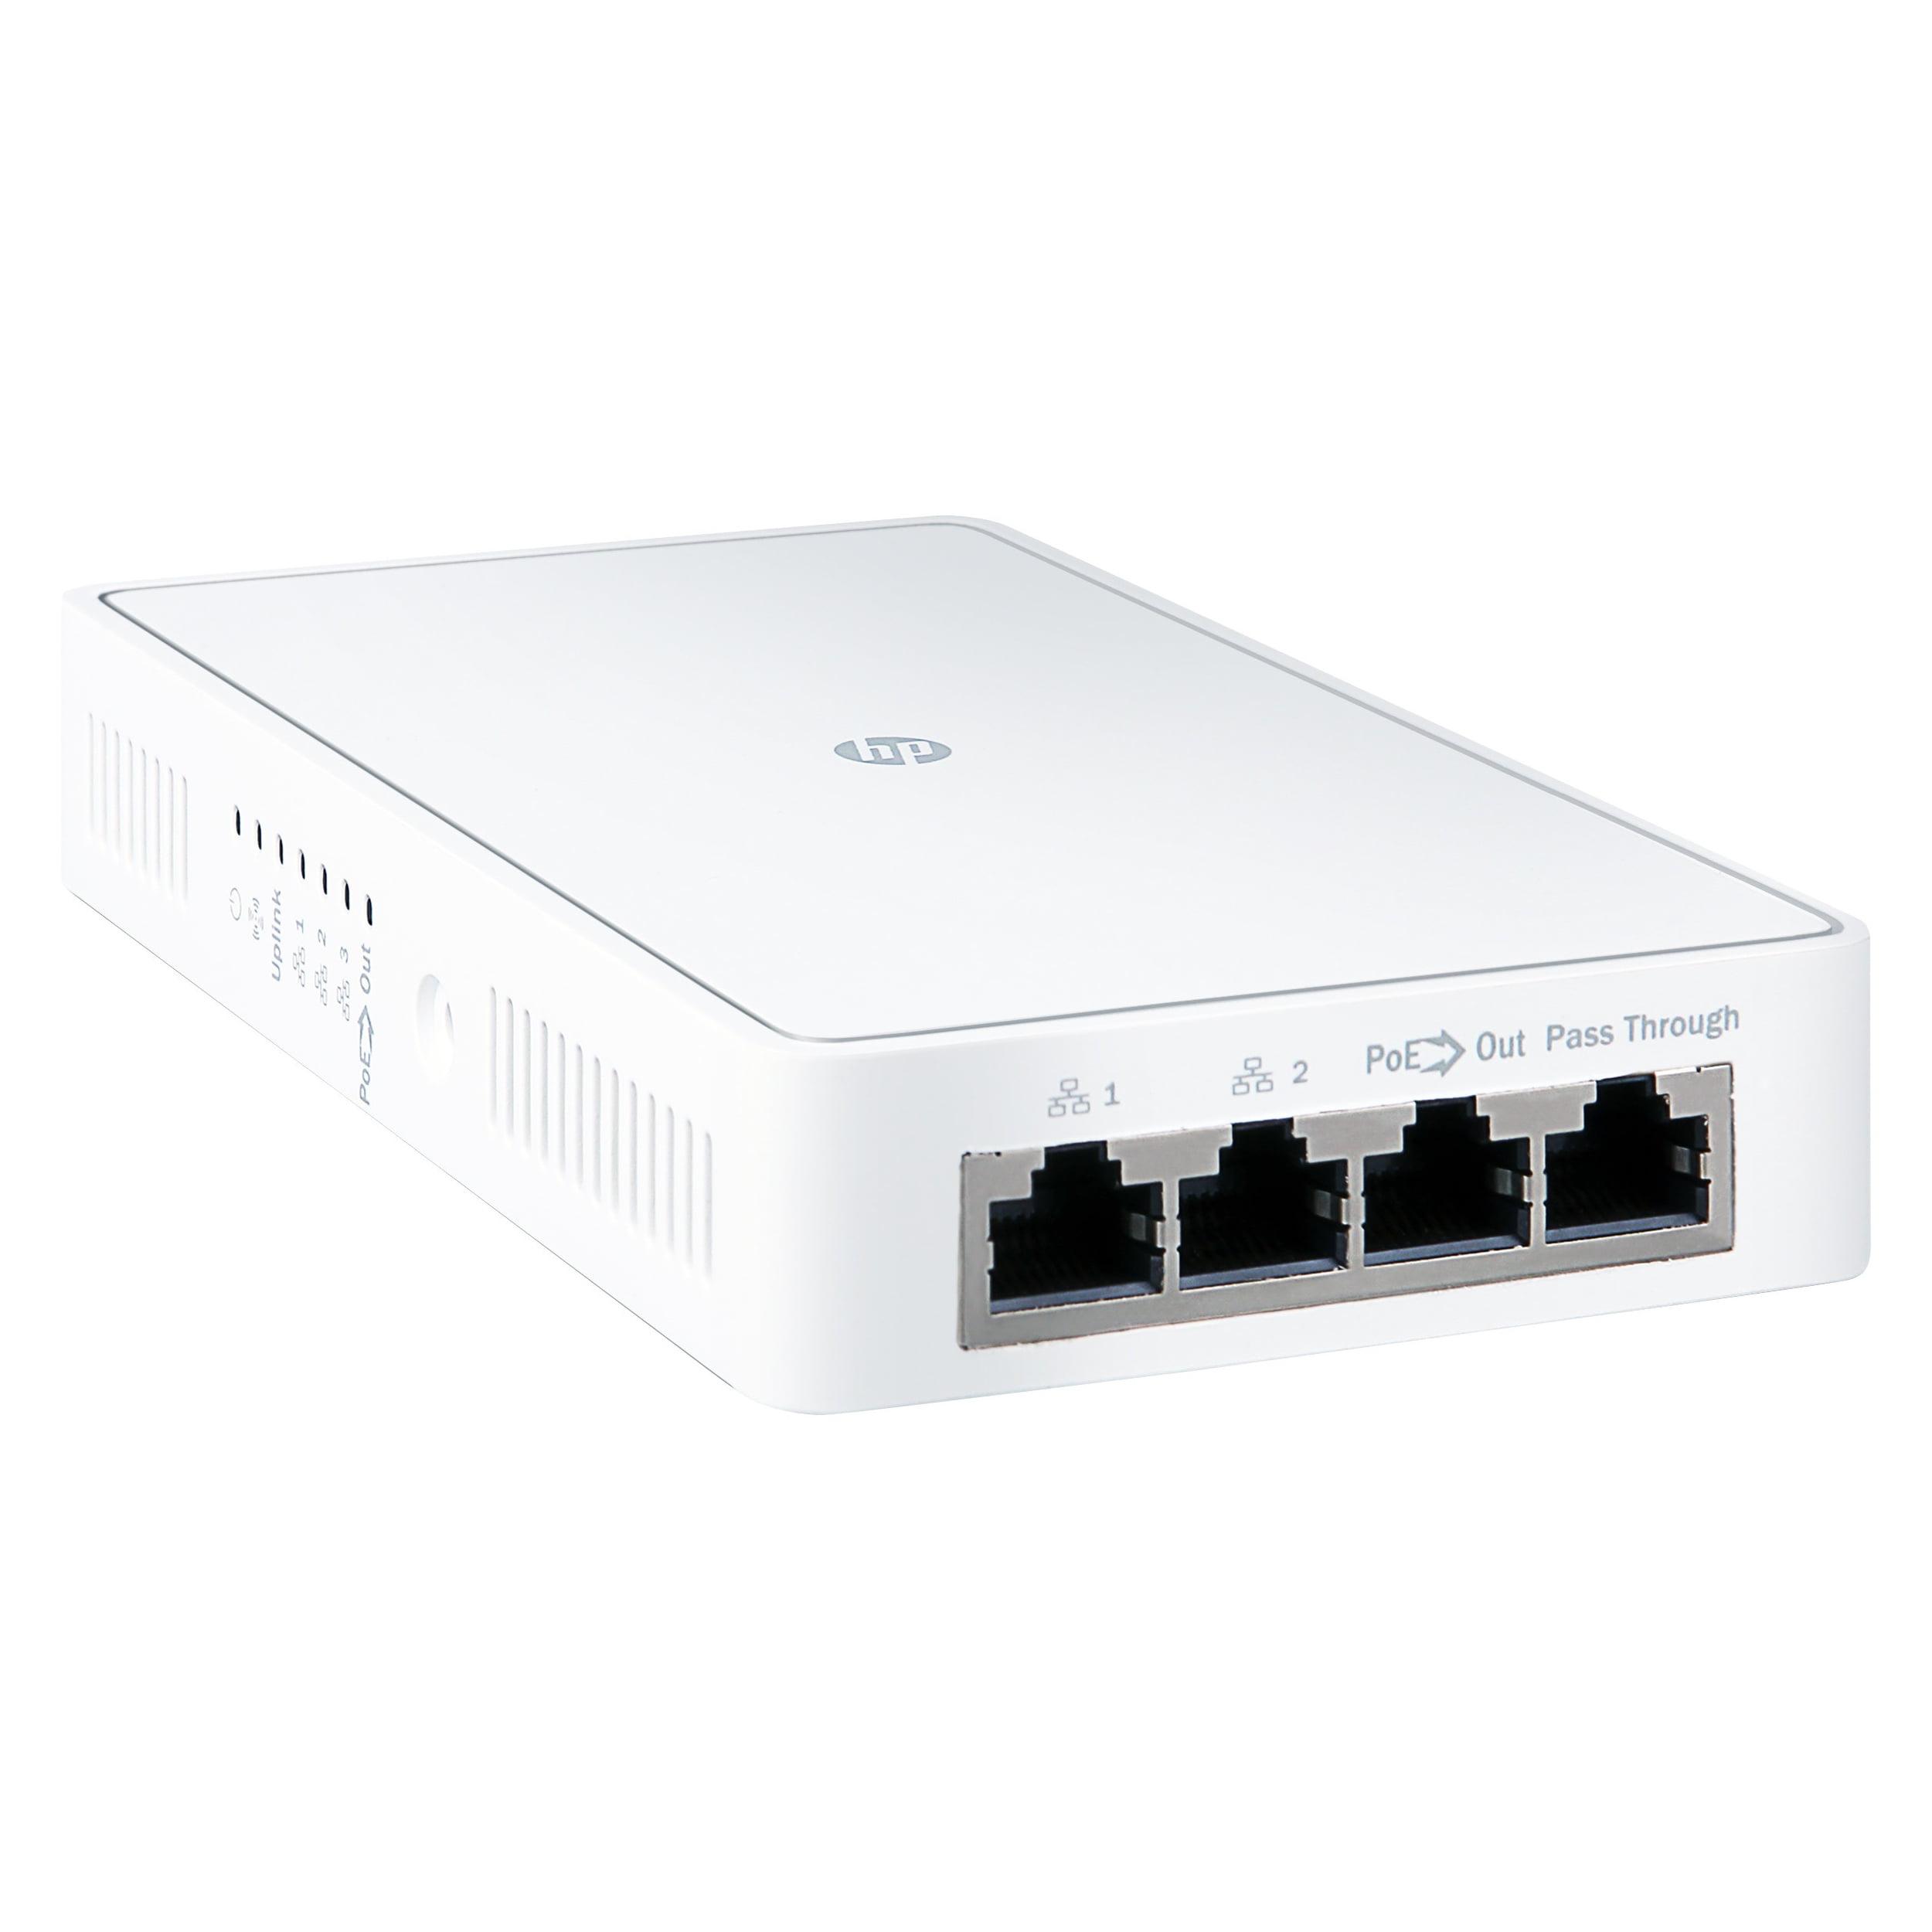 HPE 527 (AM) Unified Wired-WLAN Walljack - Wireless acces...